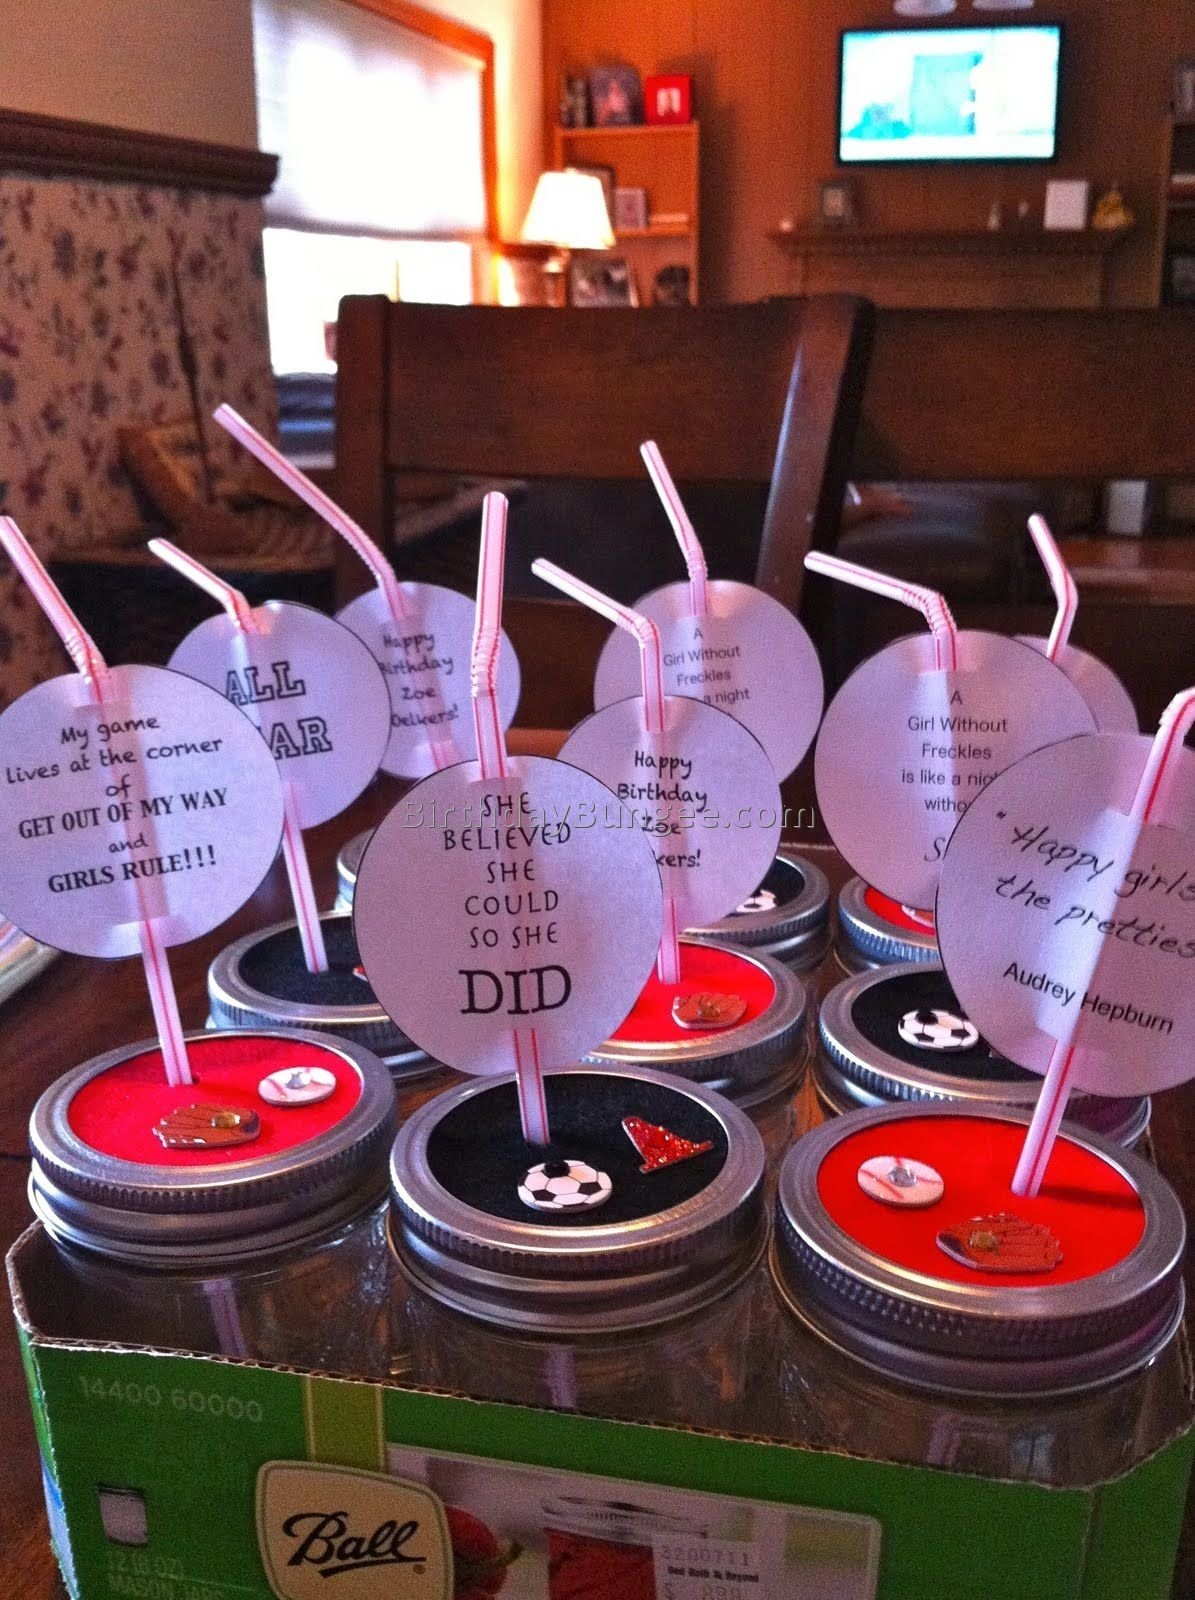 10 Great 12 Yr Old Birthday Ideas baby shower decorations pink camo tags baby shower decorations for 2021